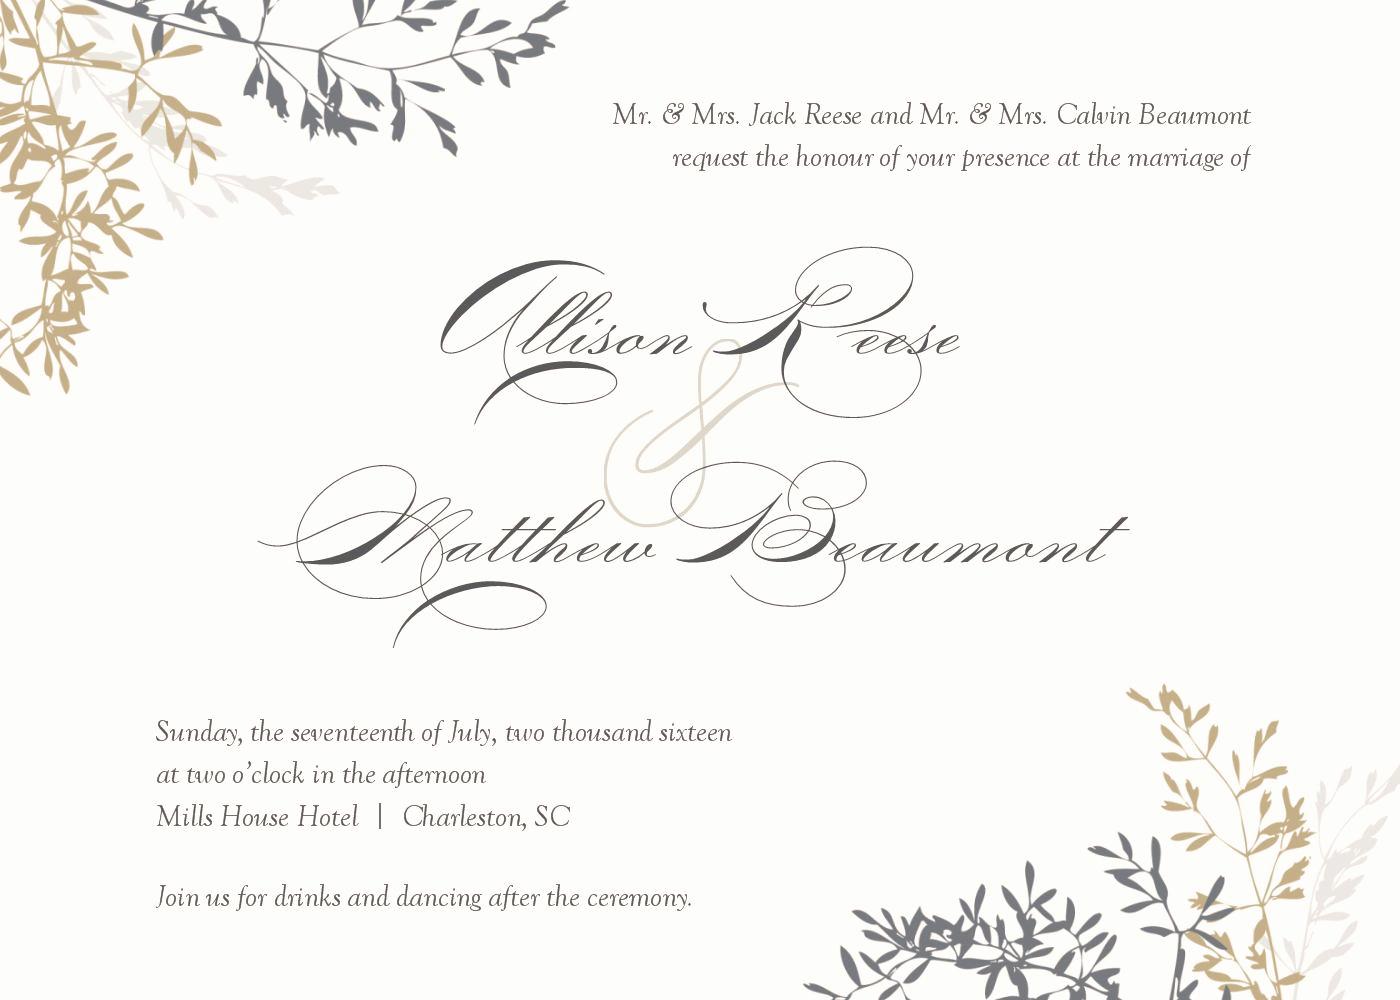 Free Wedding Invitation Templates Downloads Best Of Wedding Invitation Wedding Invitations Template Superb